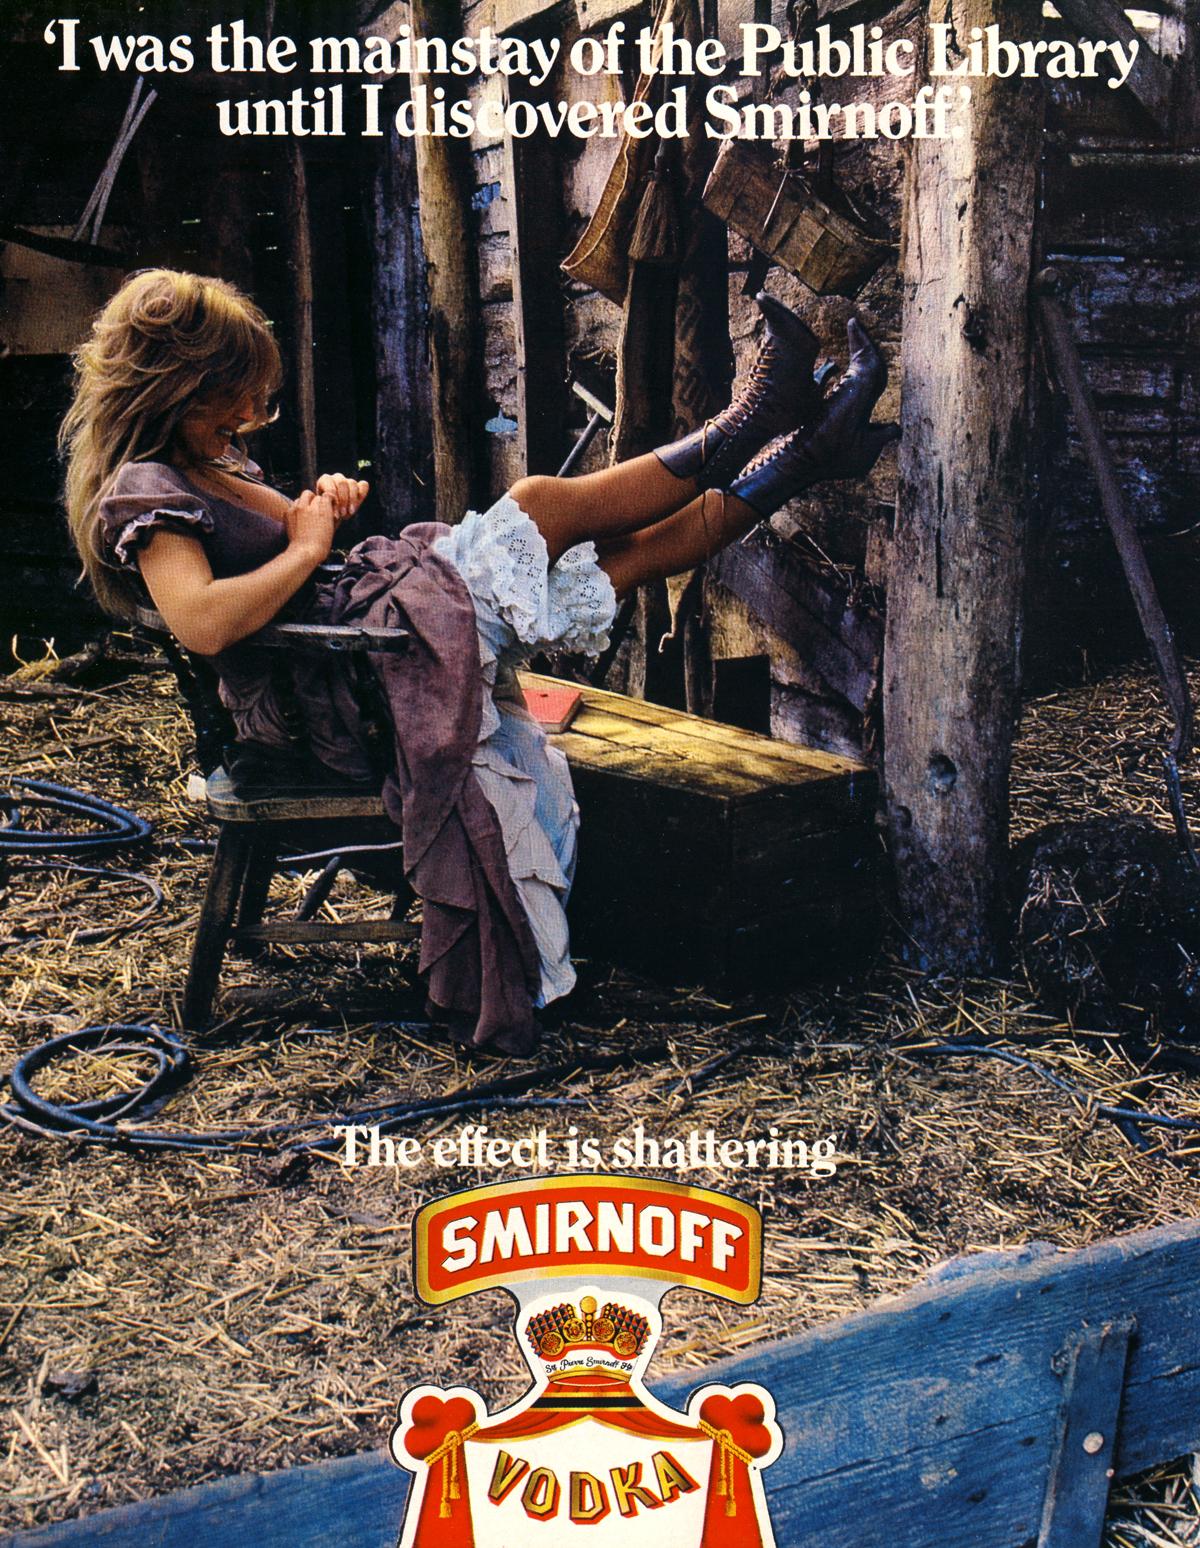 smirnoff - 19 magazine - oct 72